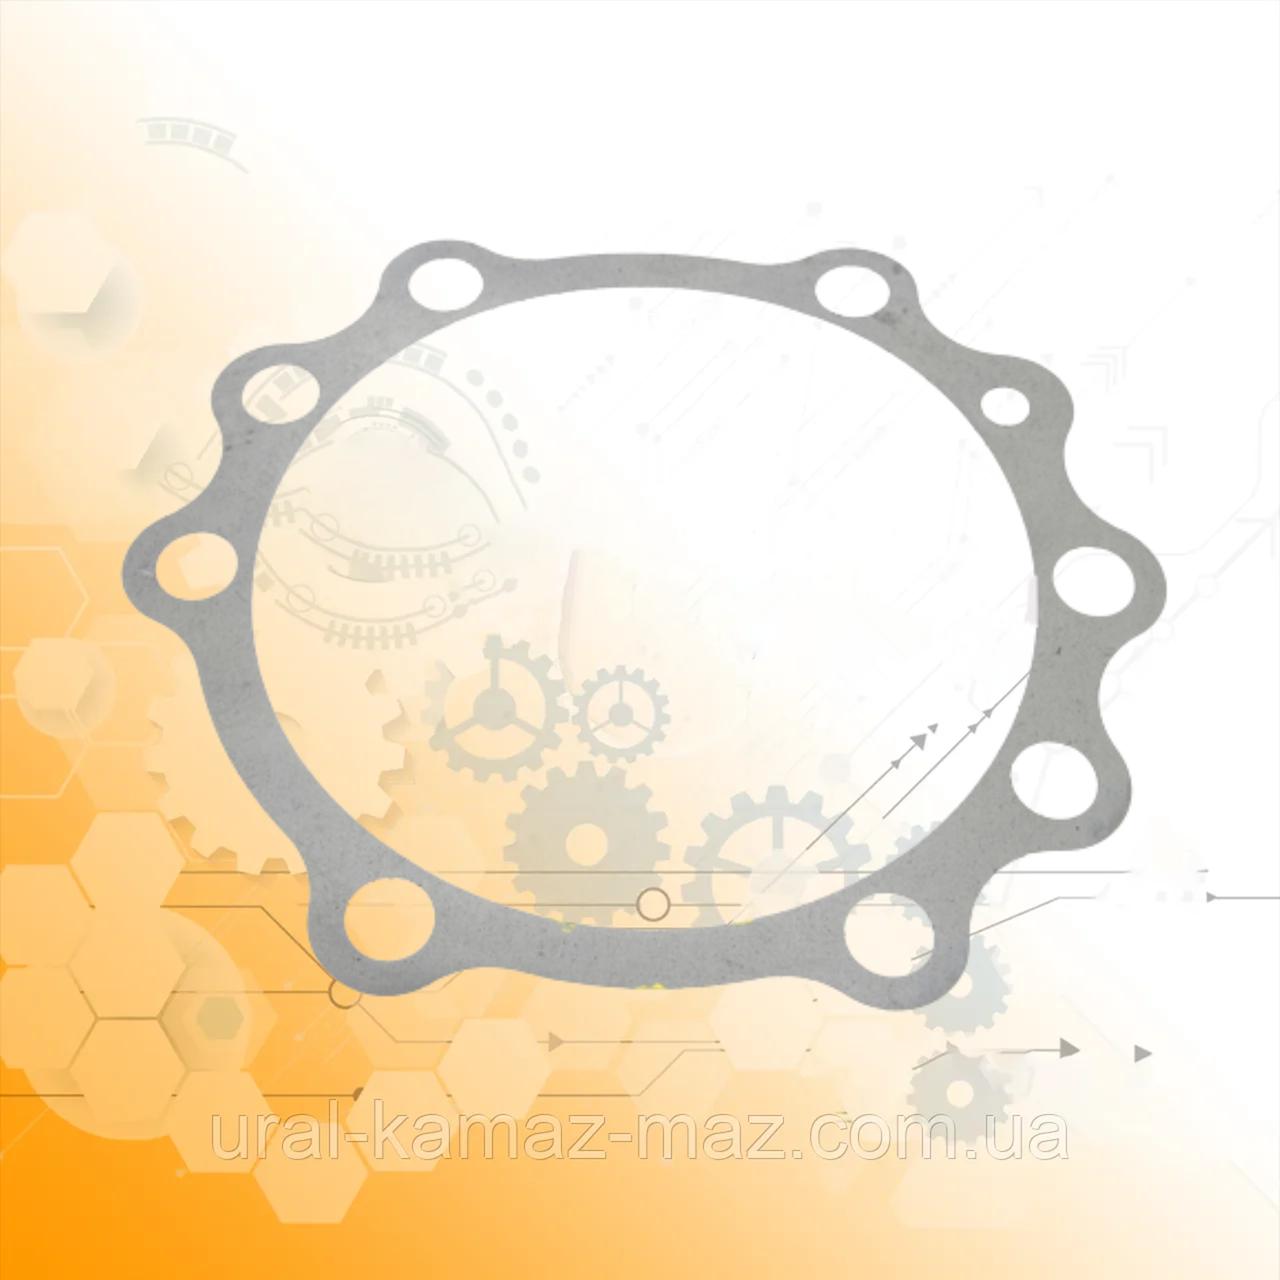 Прокладка стакан подшипников редуктора 0,1мм 375-2402127